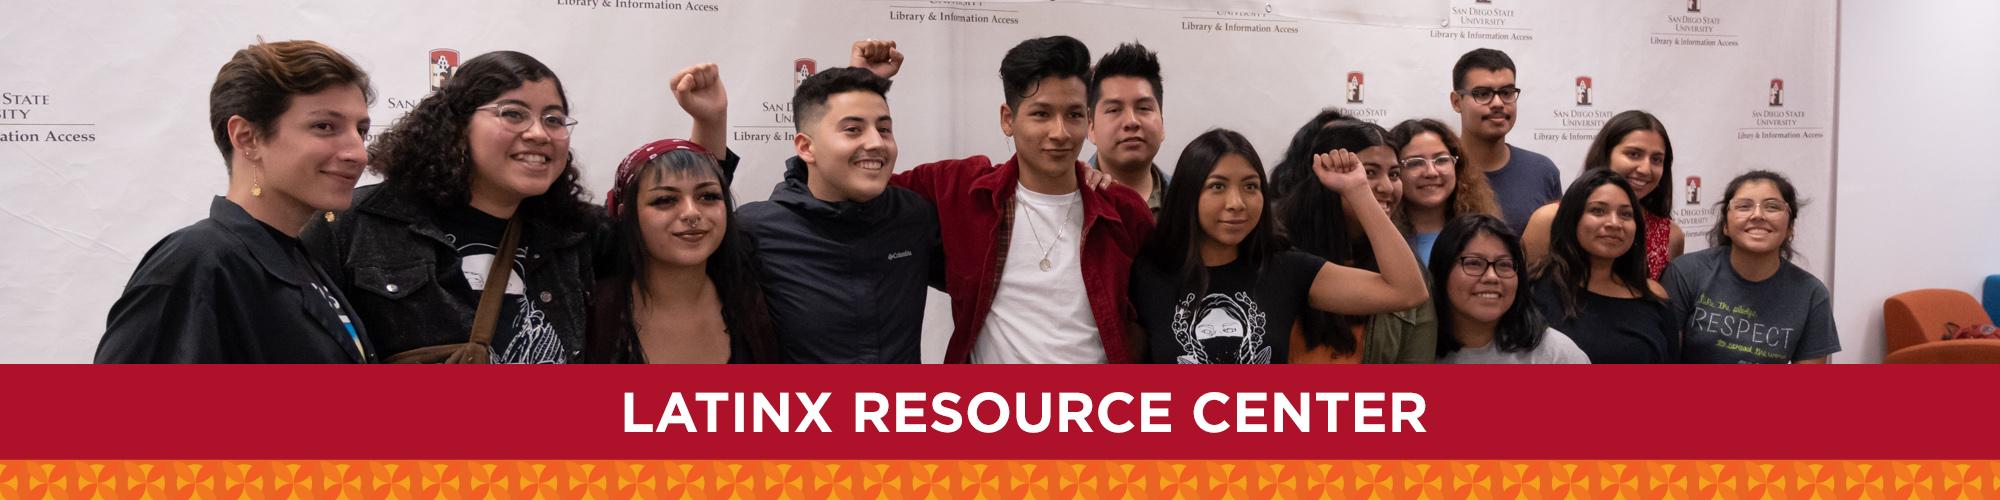 Latinx Resource Center students